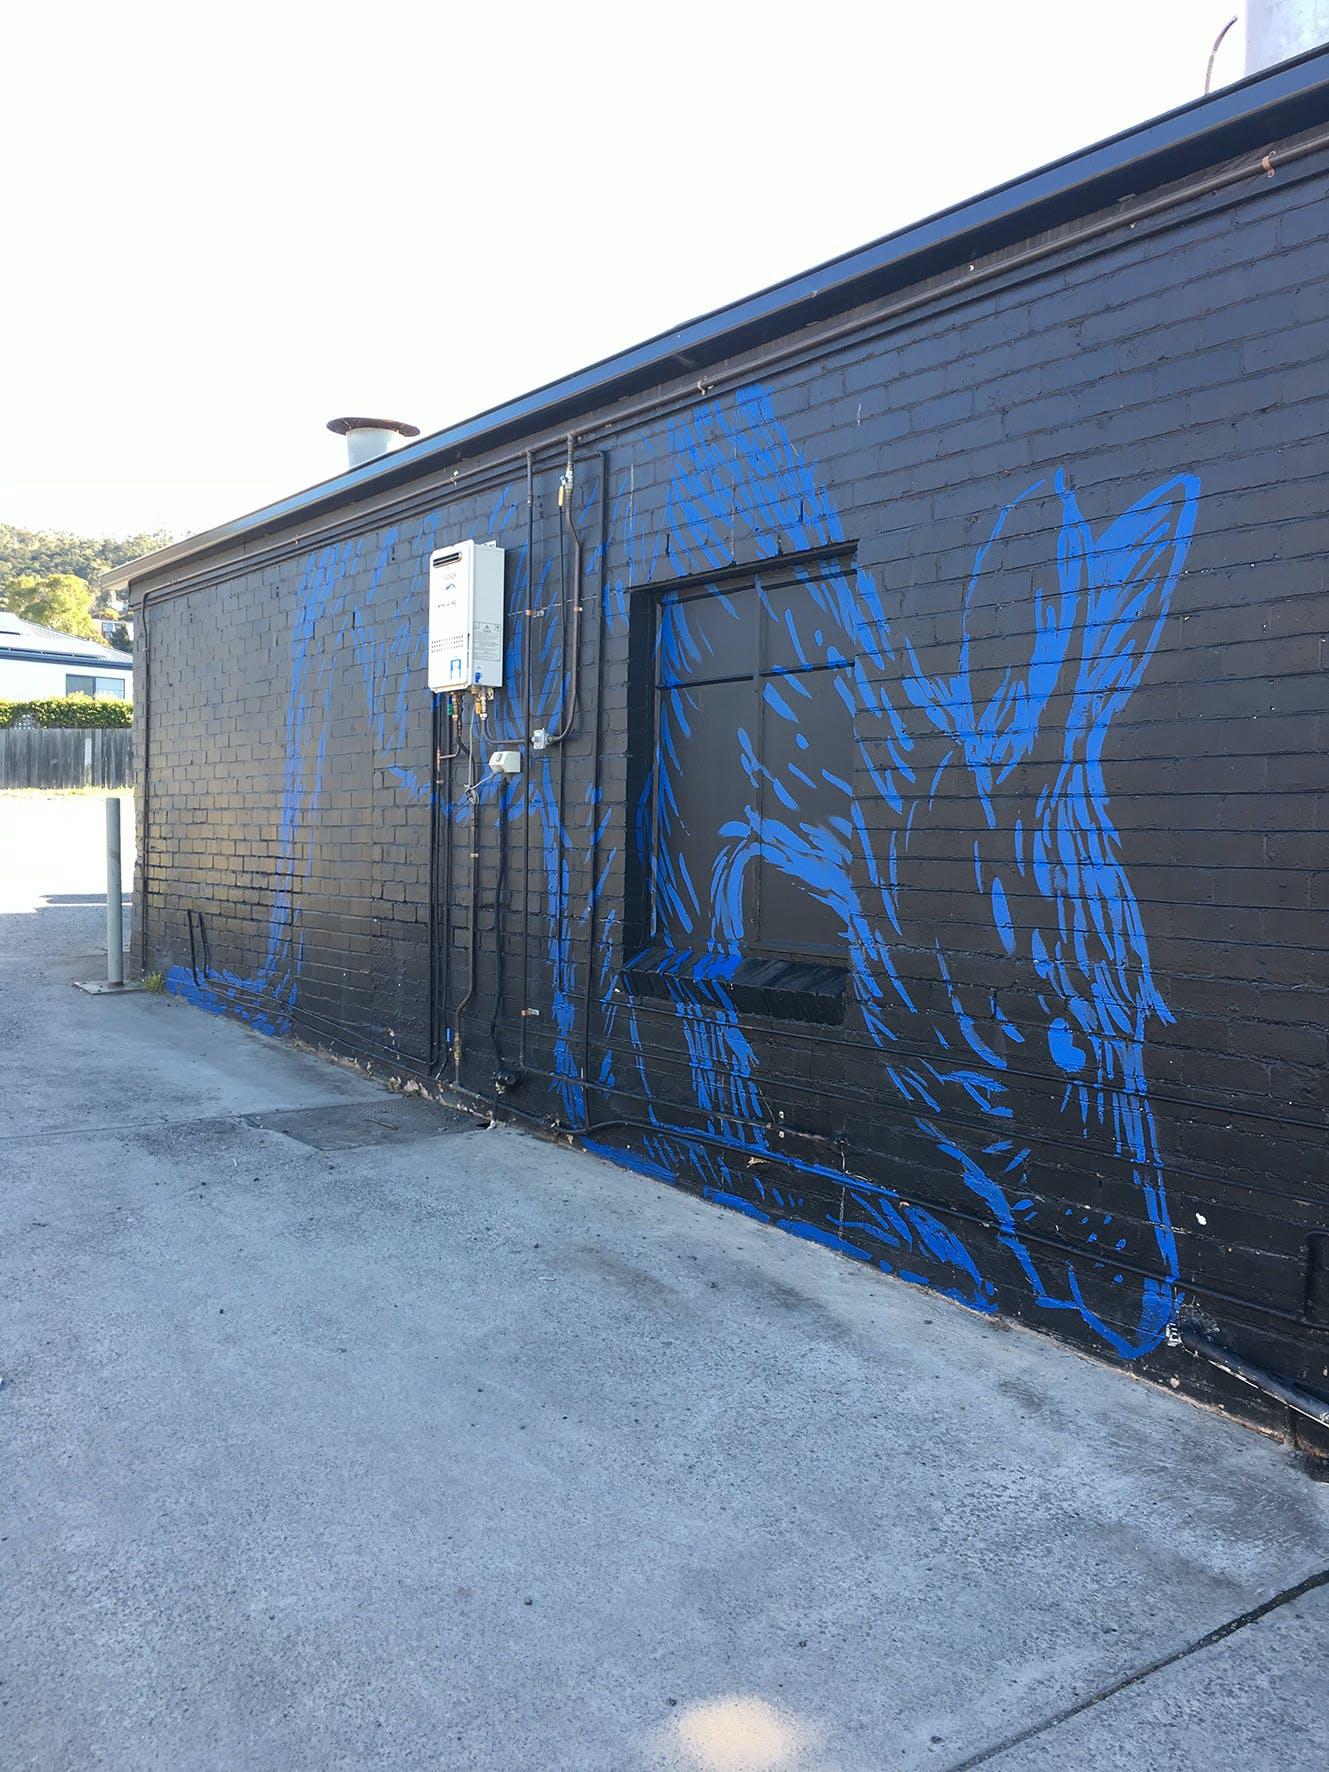 First Mural - Kangaroo